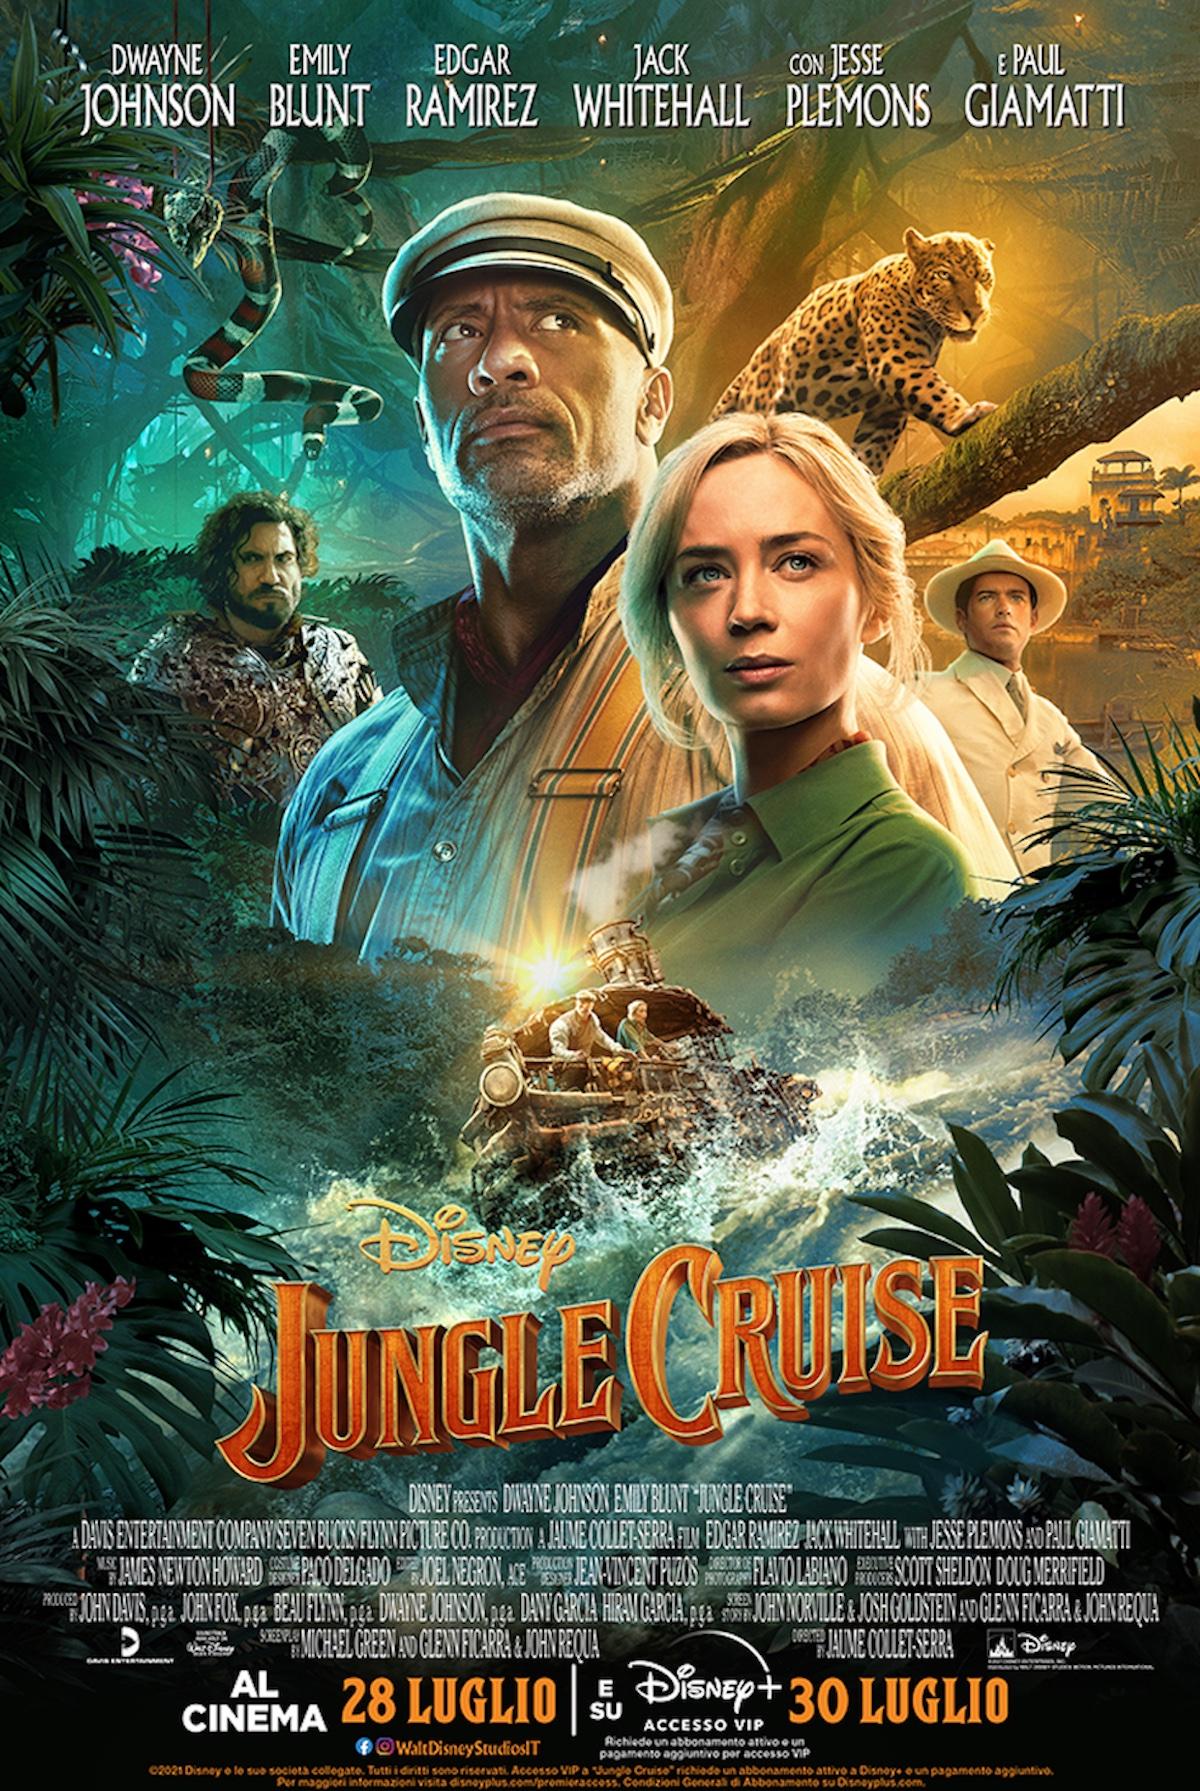 Jungle Cruise - Jaume Collet-Serra